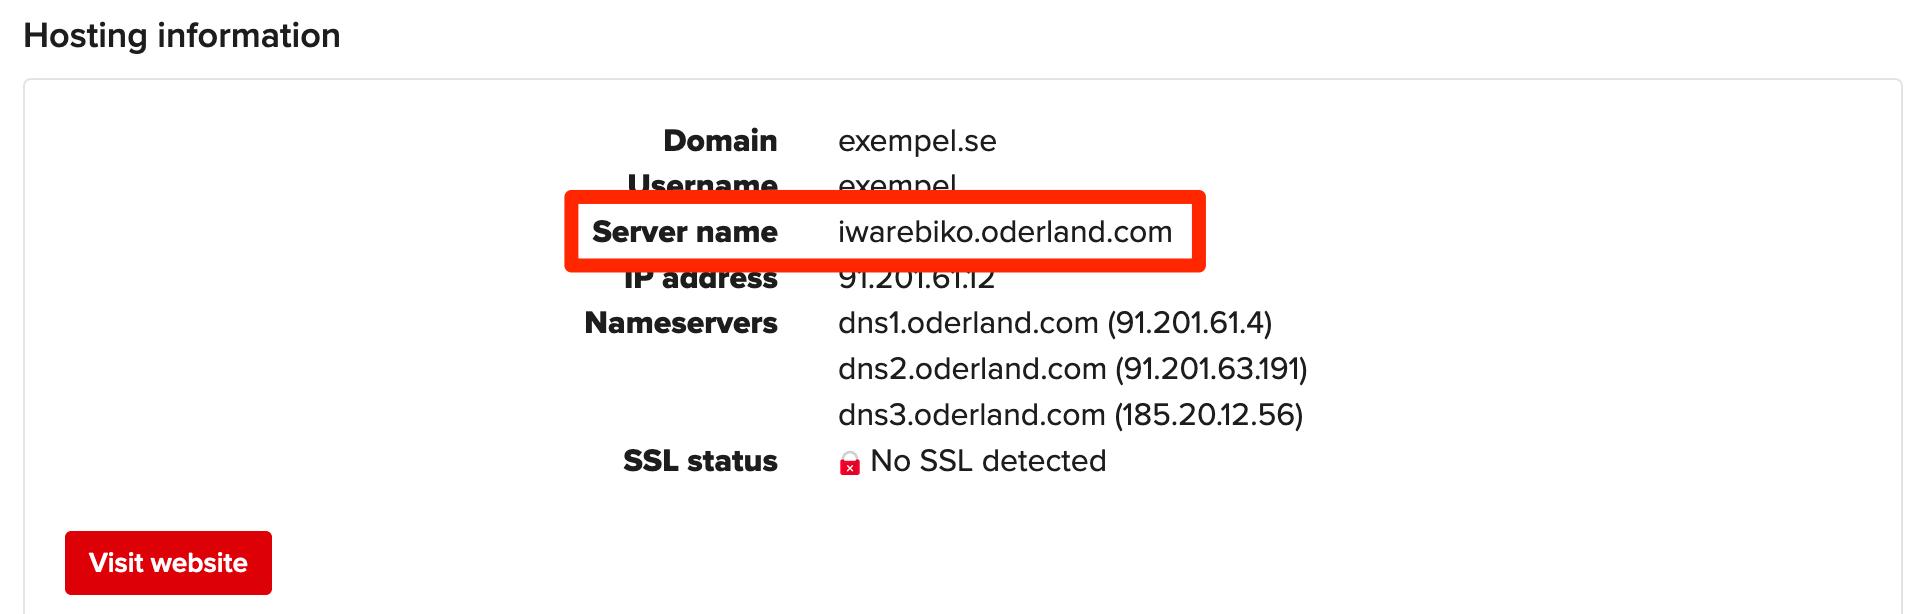 Service server name